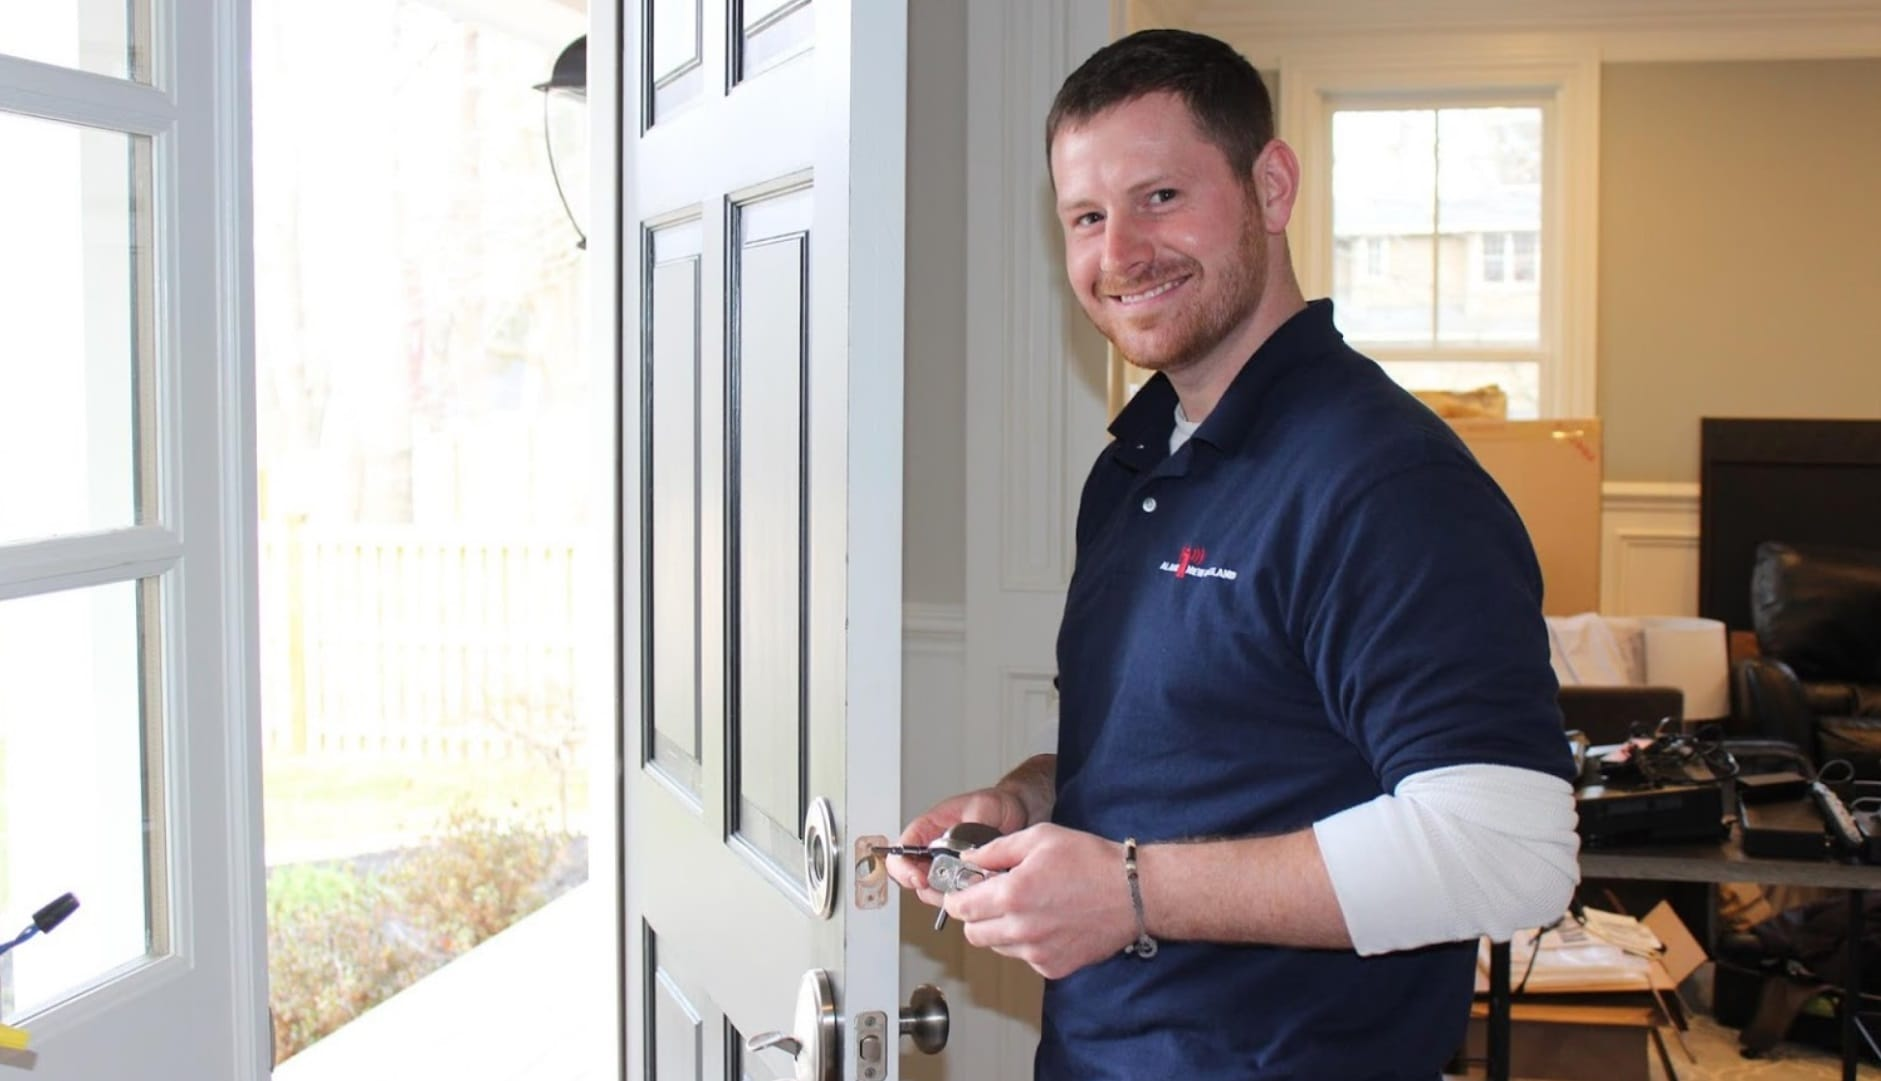 3 Best Local Alarm Companies in Massachusetts